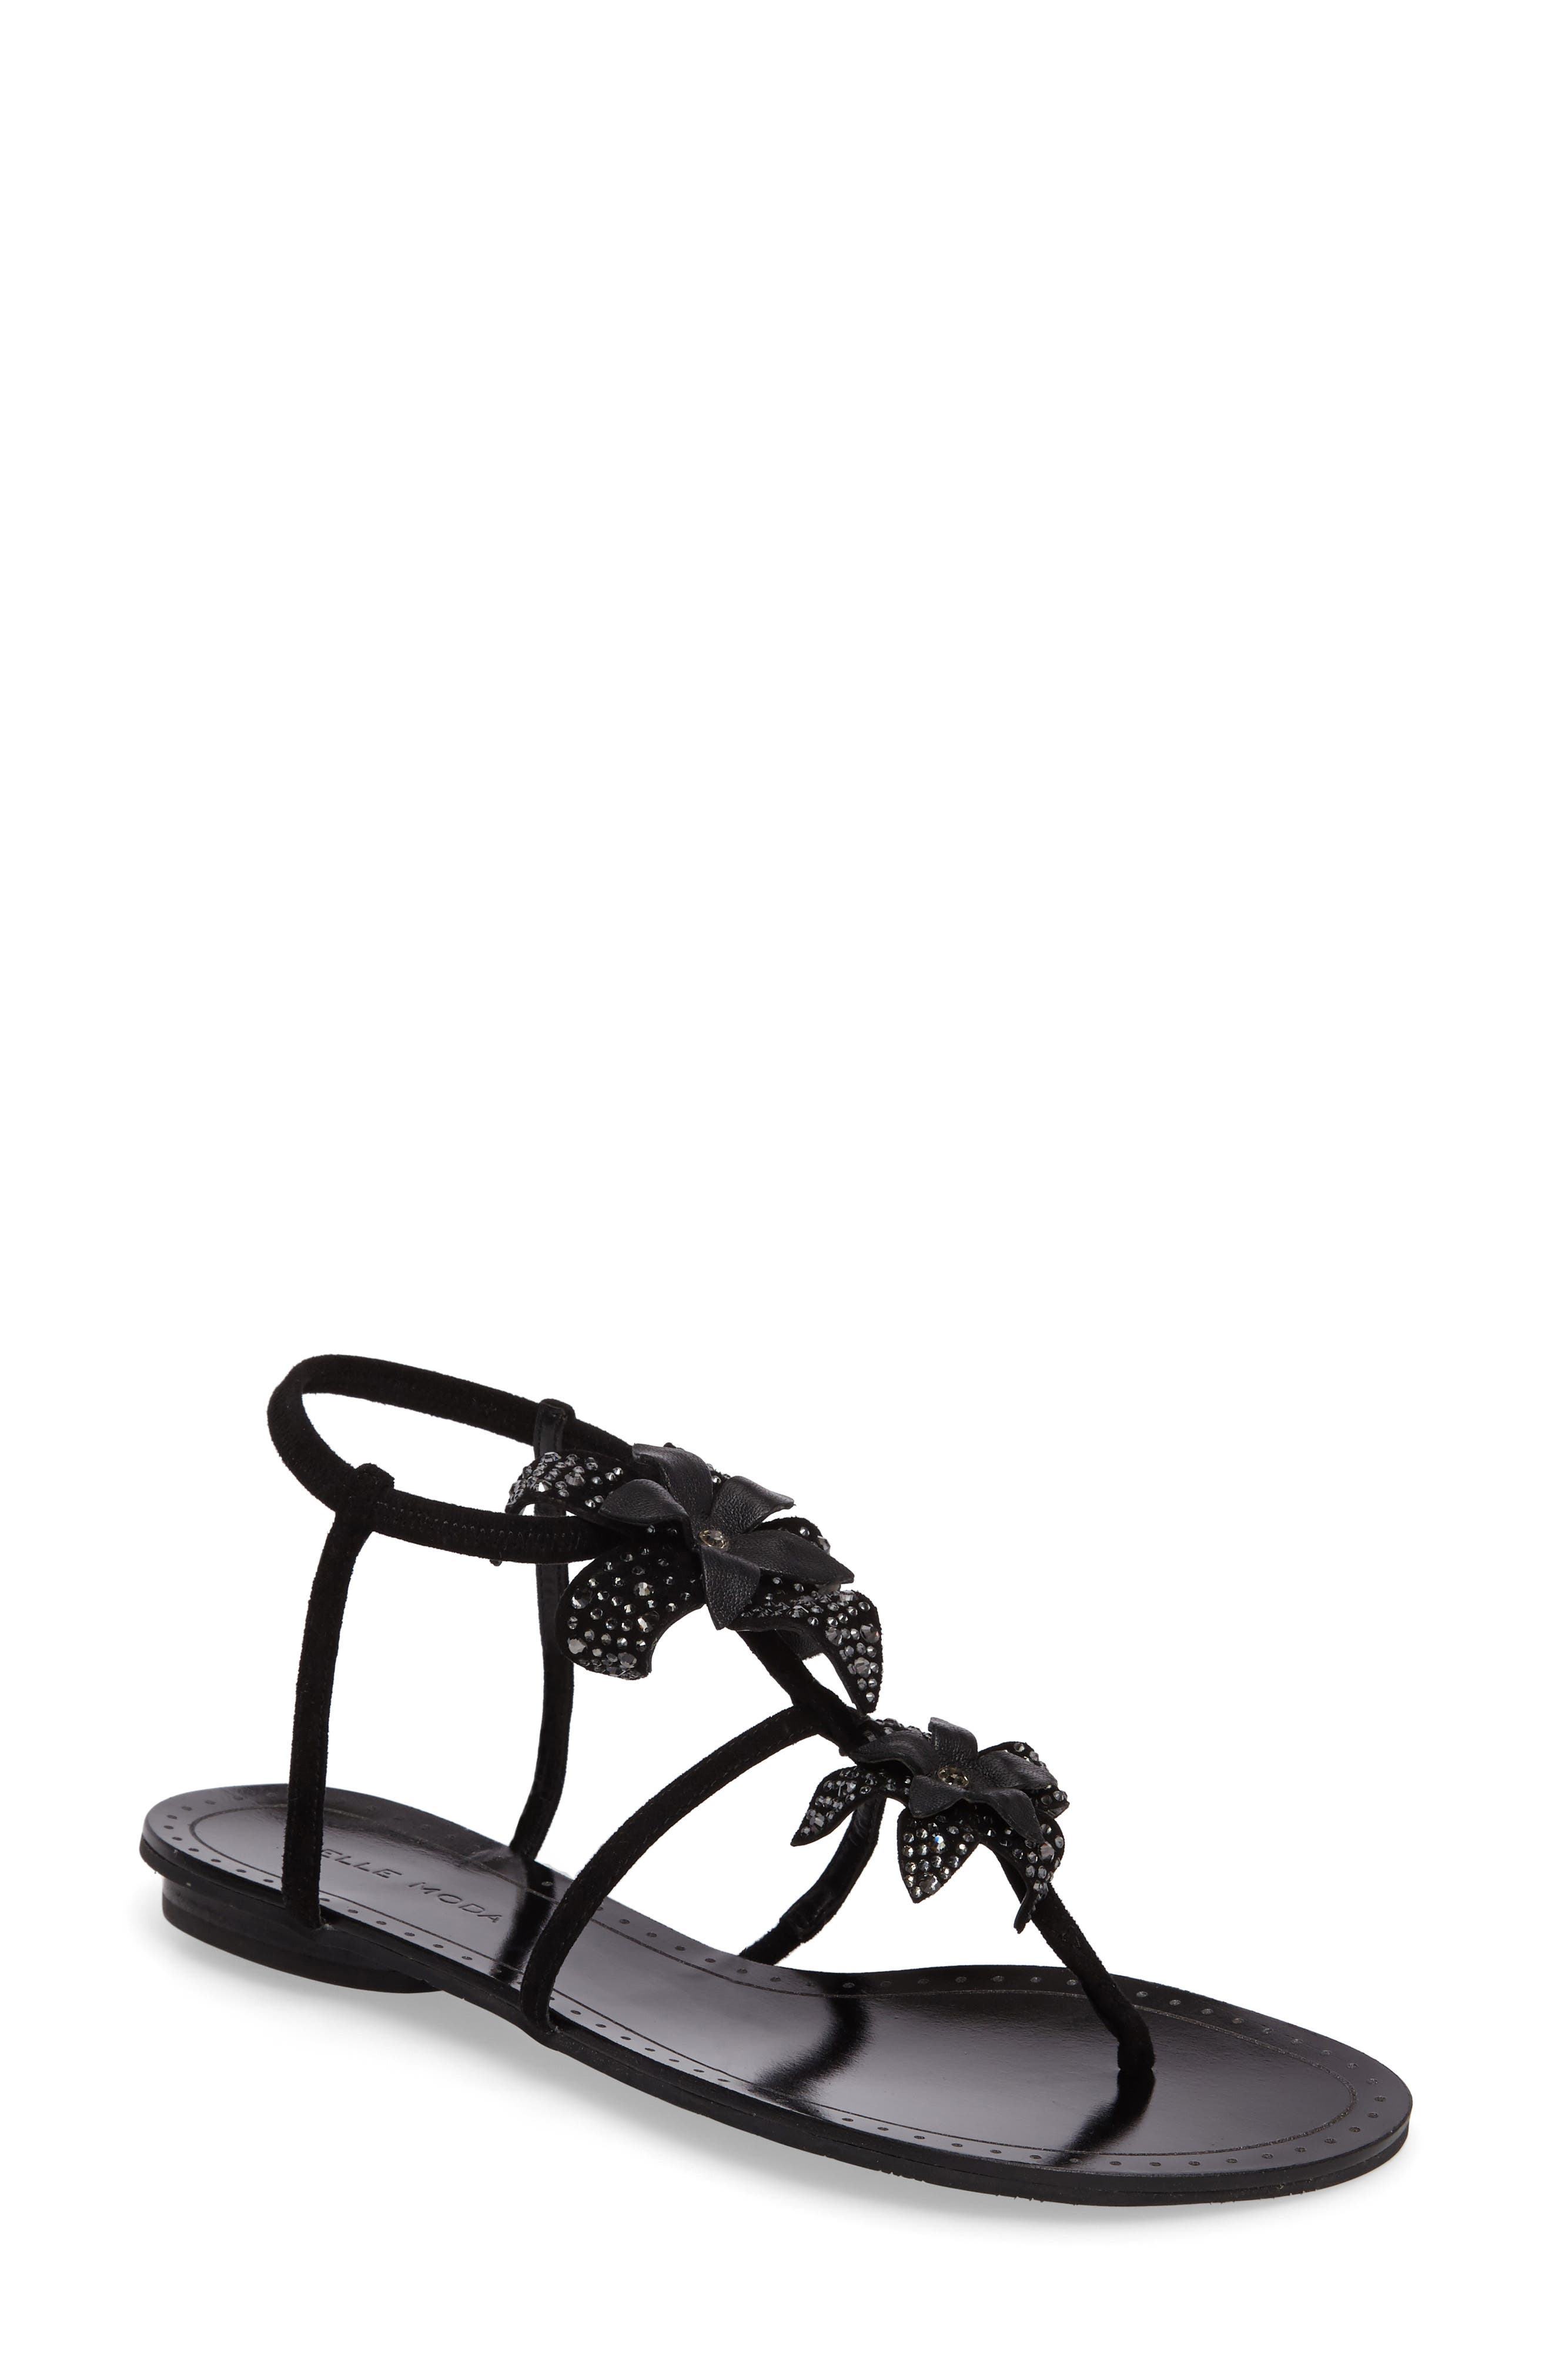 Ellis Strappy Flowered Sandal,                             Main thumbnail 1, color,                             Black Leather